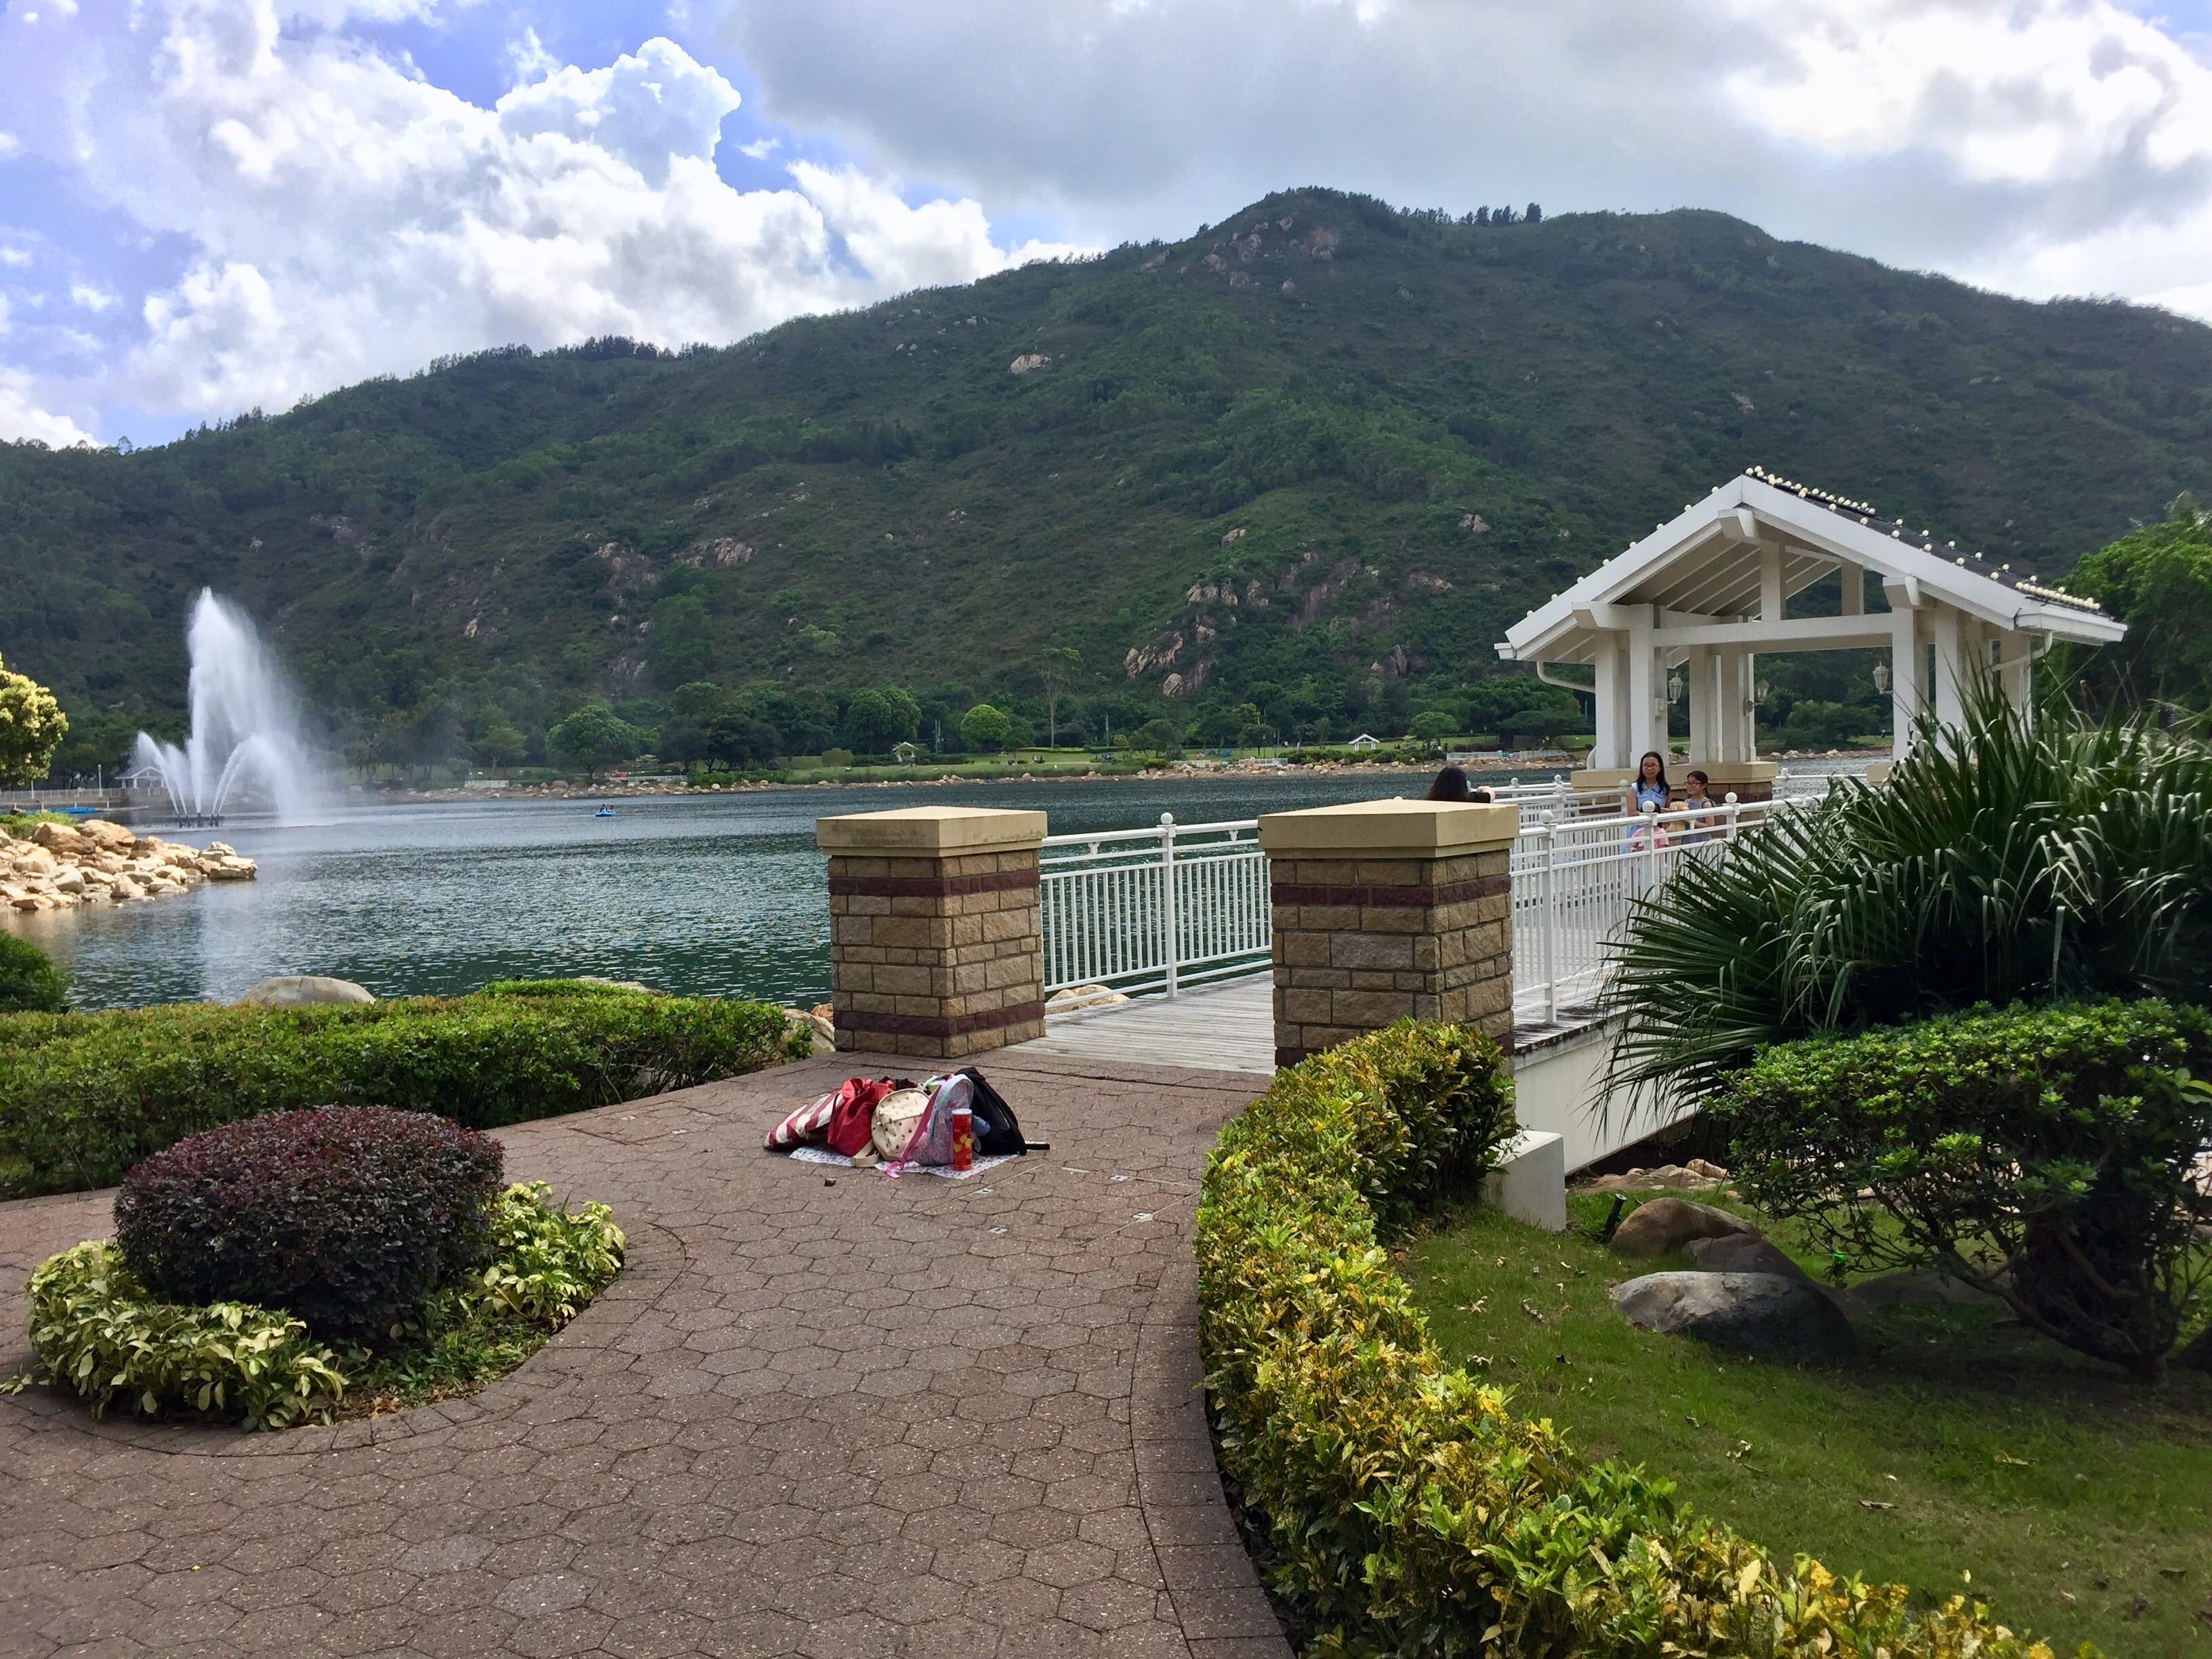 Inspiration Lake Pavilion